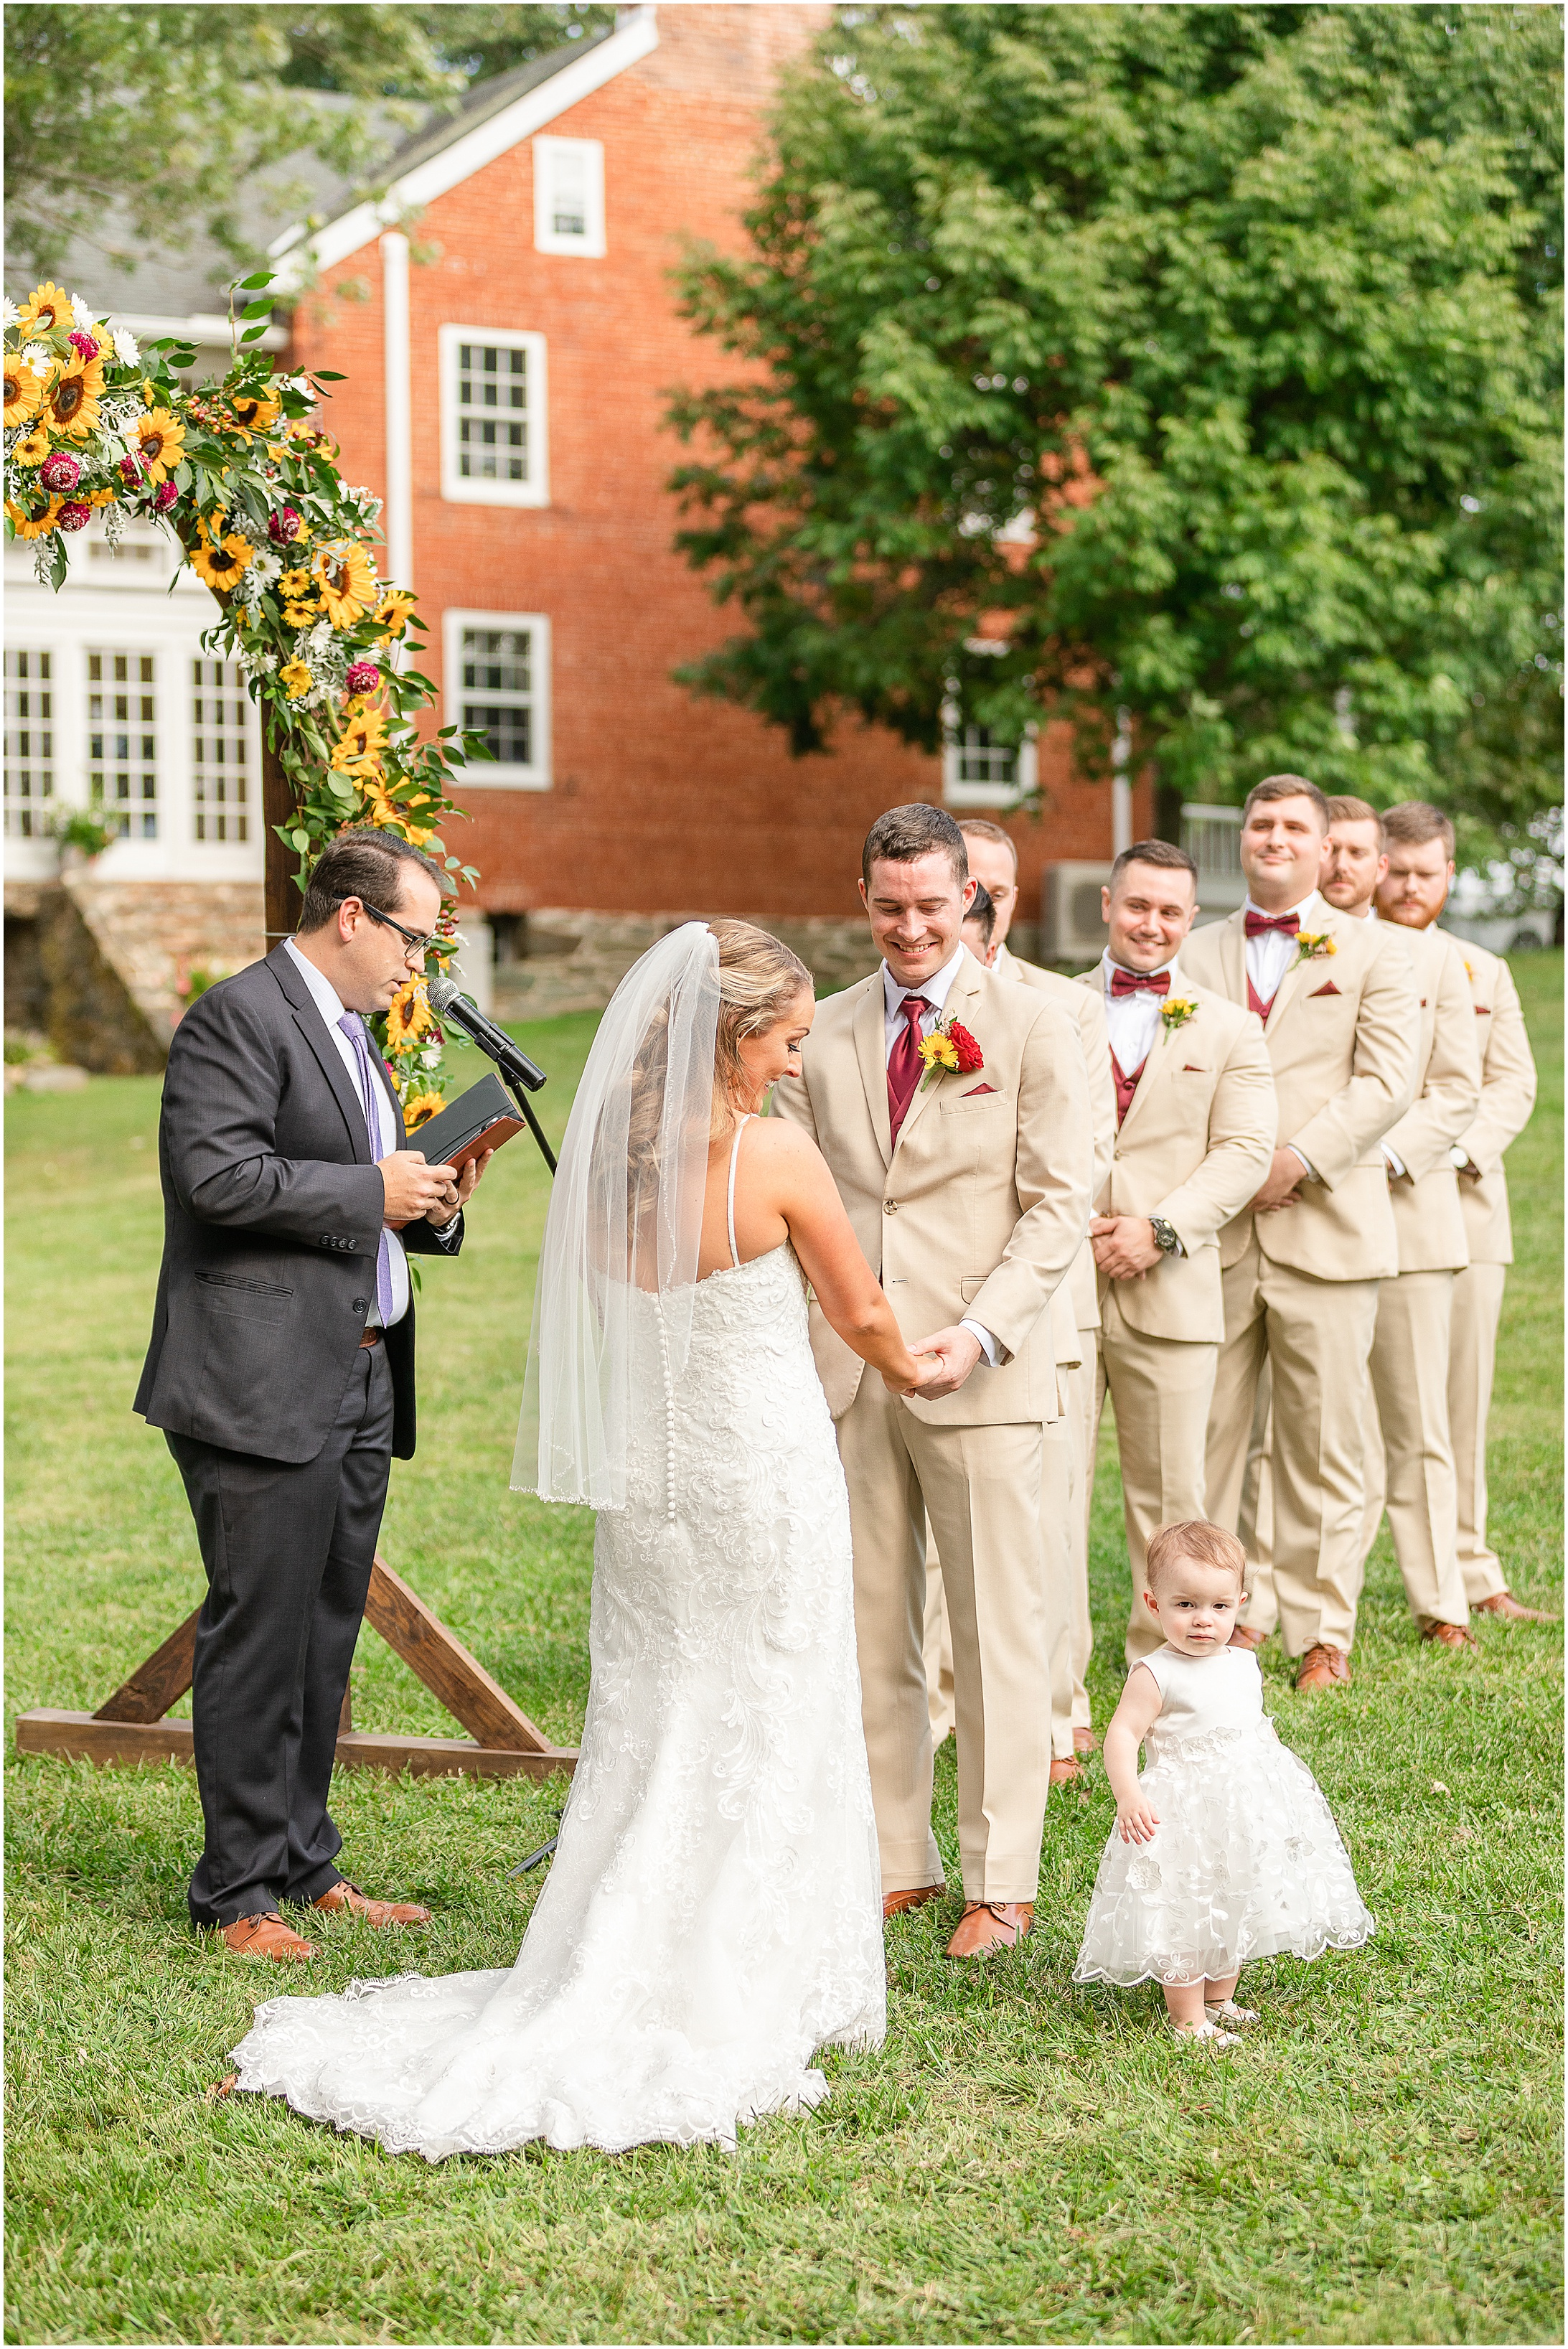 Christian-Royer-House-Wedding-Photos_0564.jpg